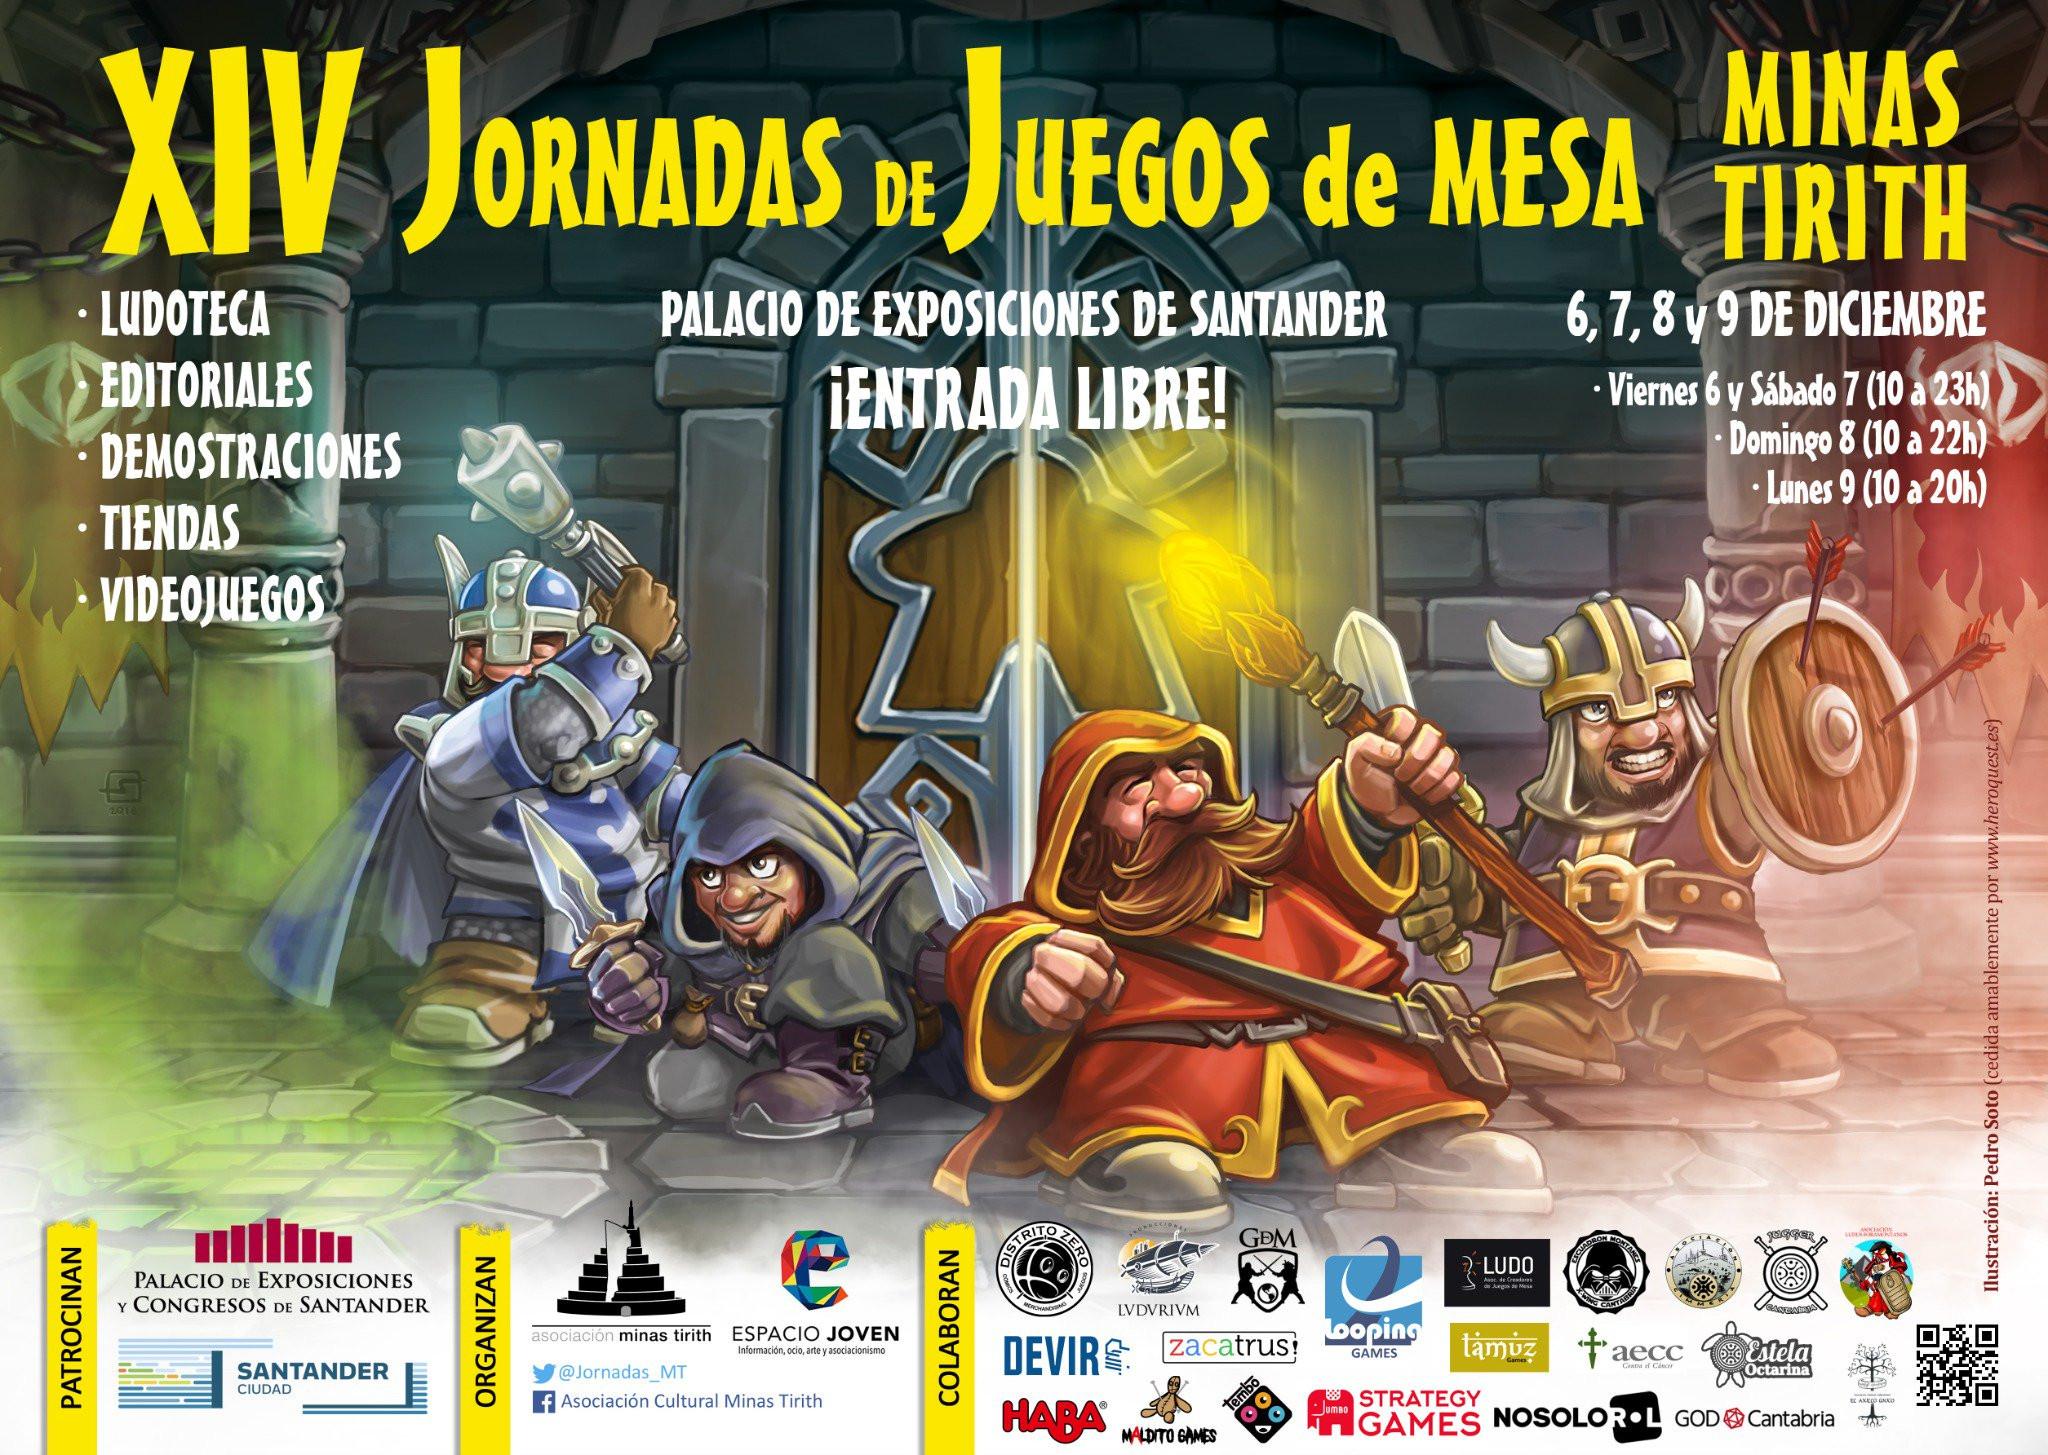 Jornadas Minas Tirith